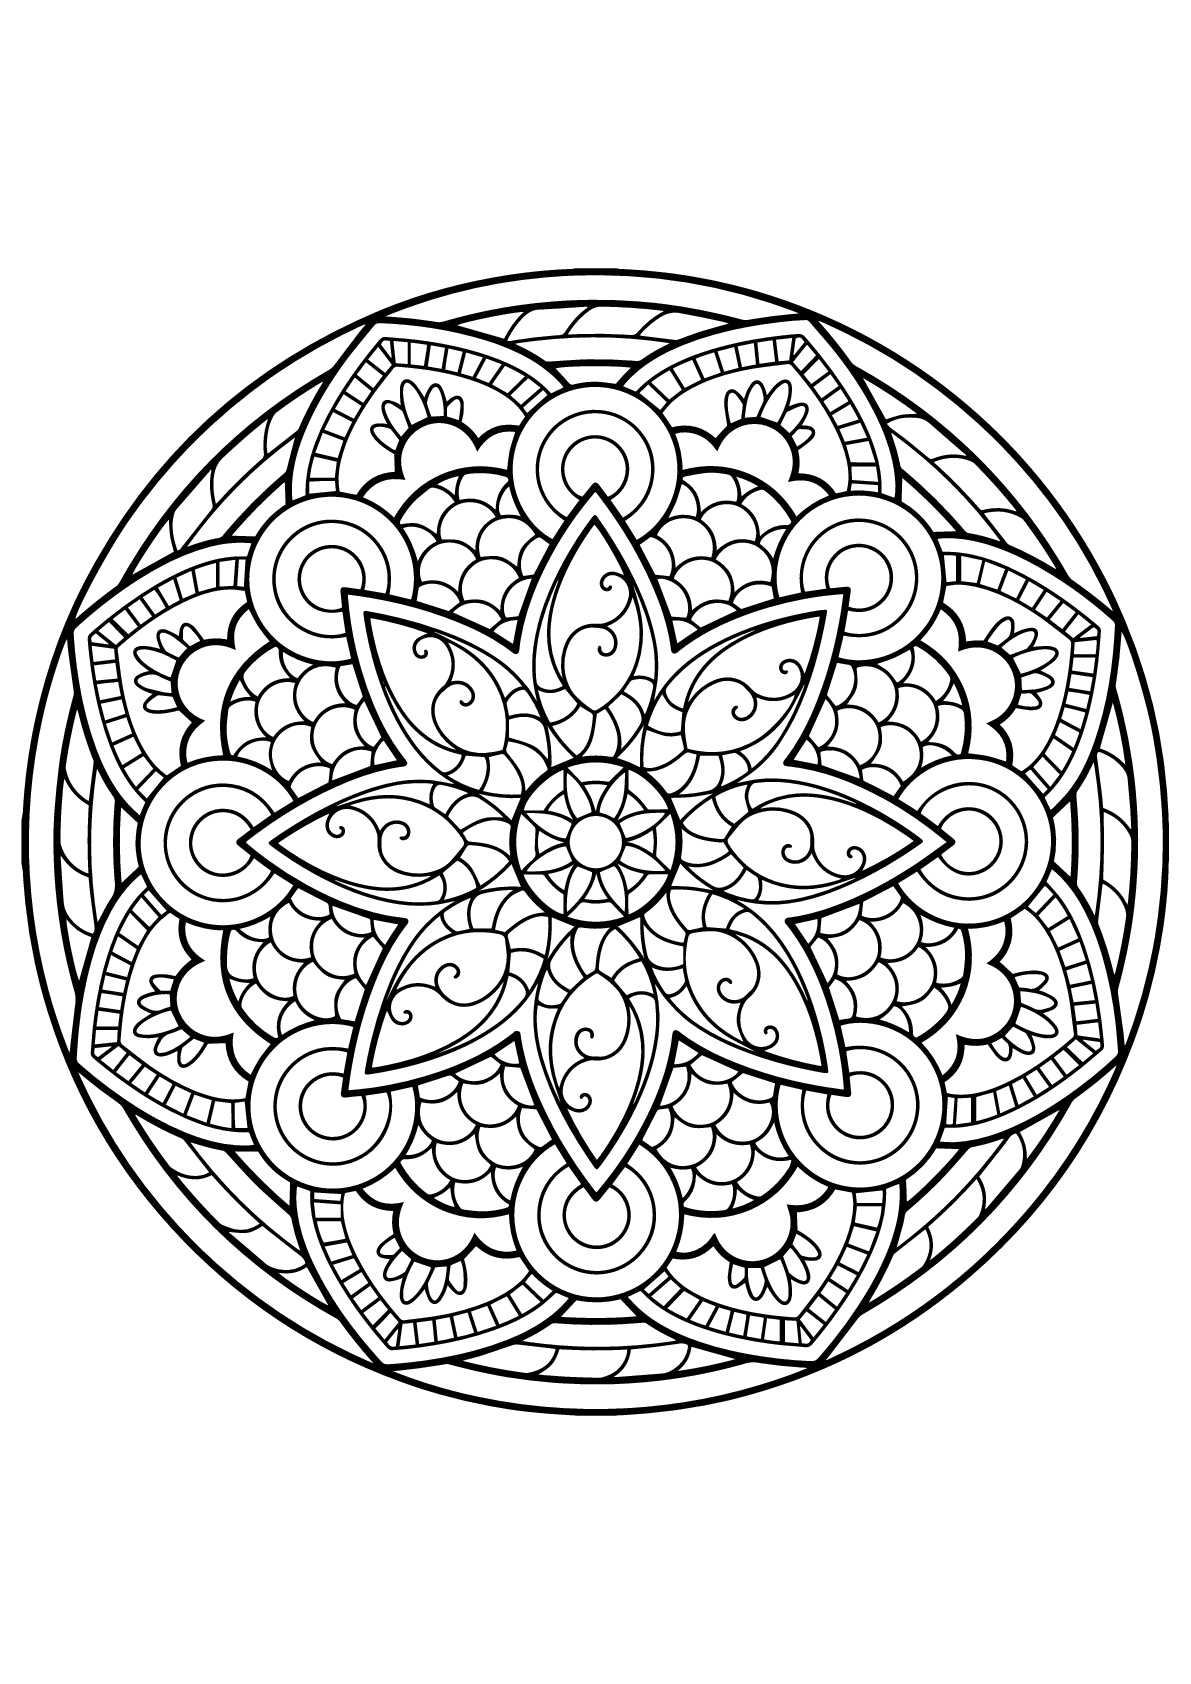 Original Mandala from Free Coloring book for adults